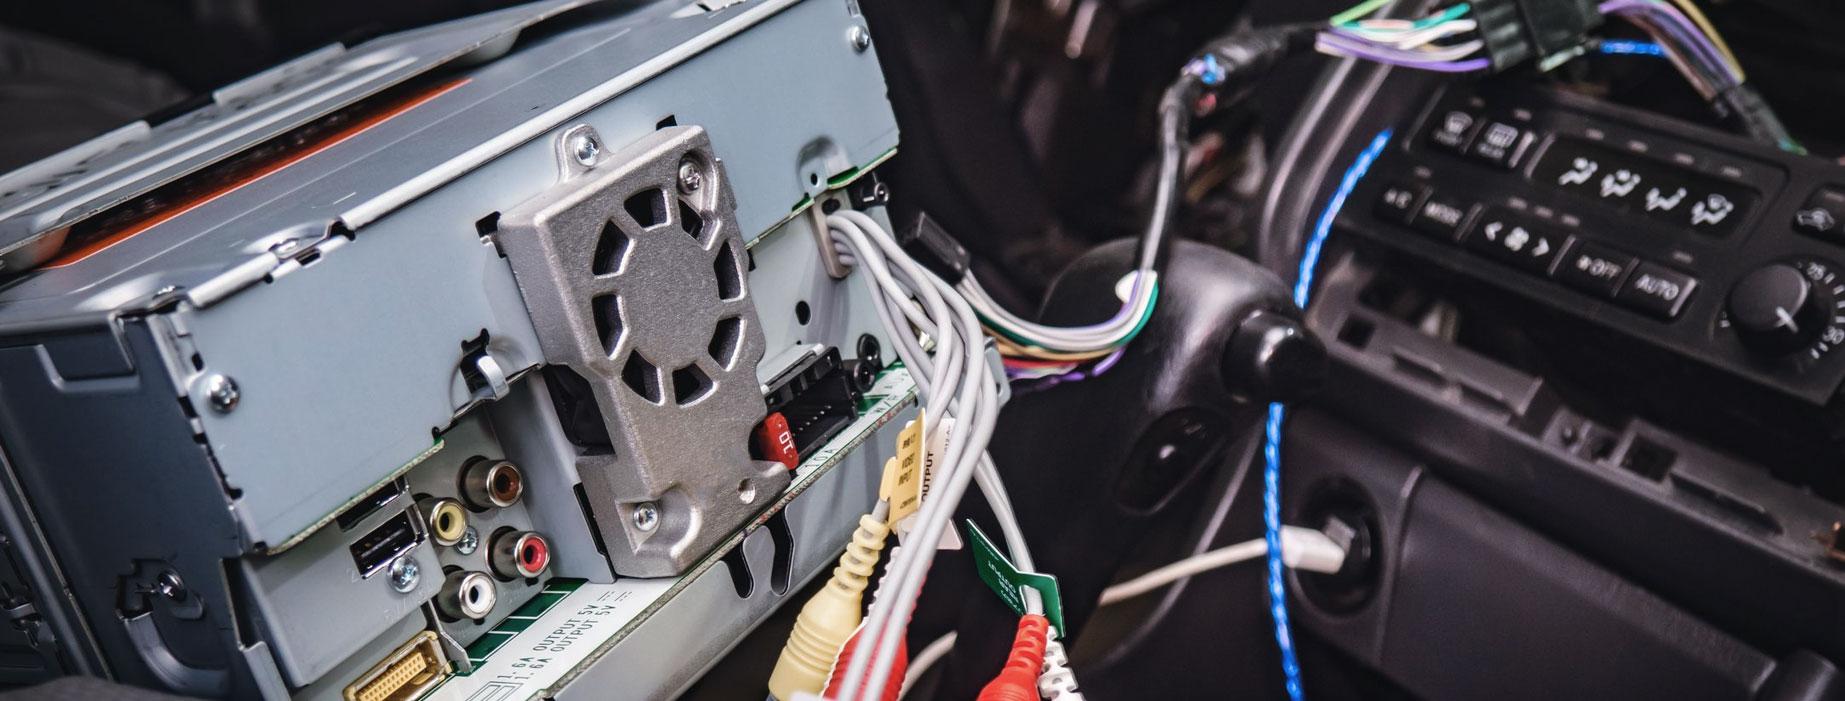 [SCHEMATICS_48EU]  Radio Wiring, What I've learned | RestoMod 忍者 | 240sx Radio Wiring |  | Restomod Ninja